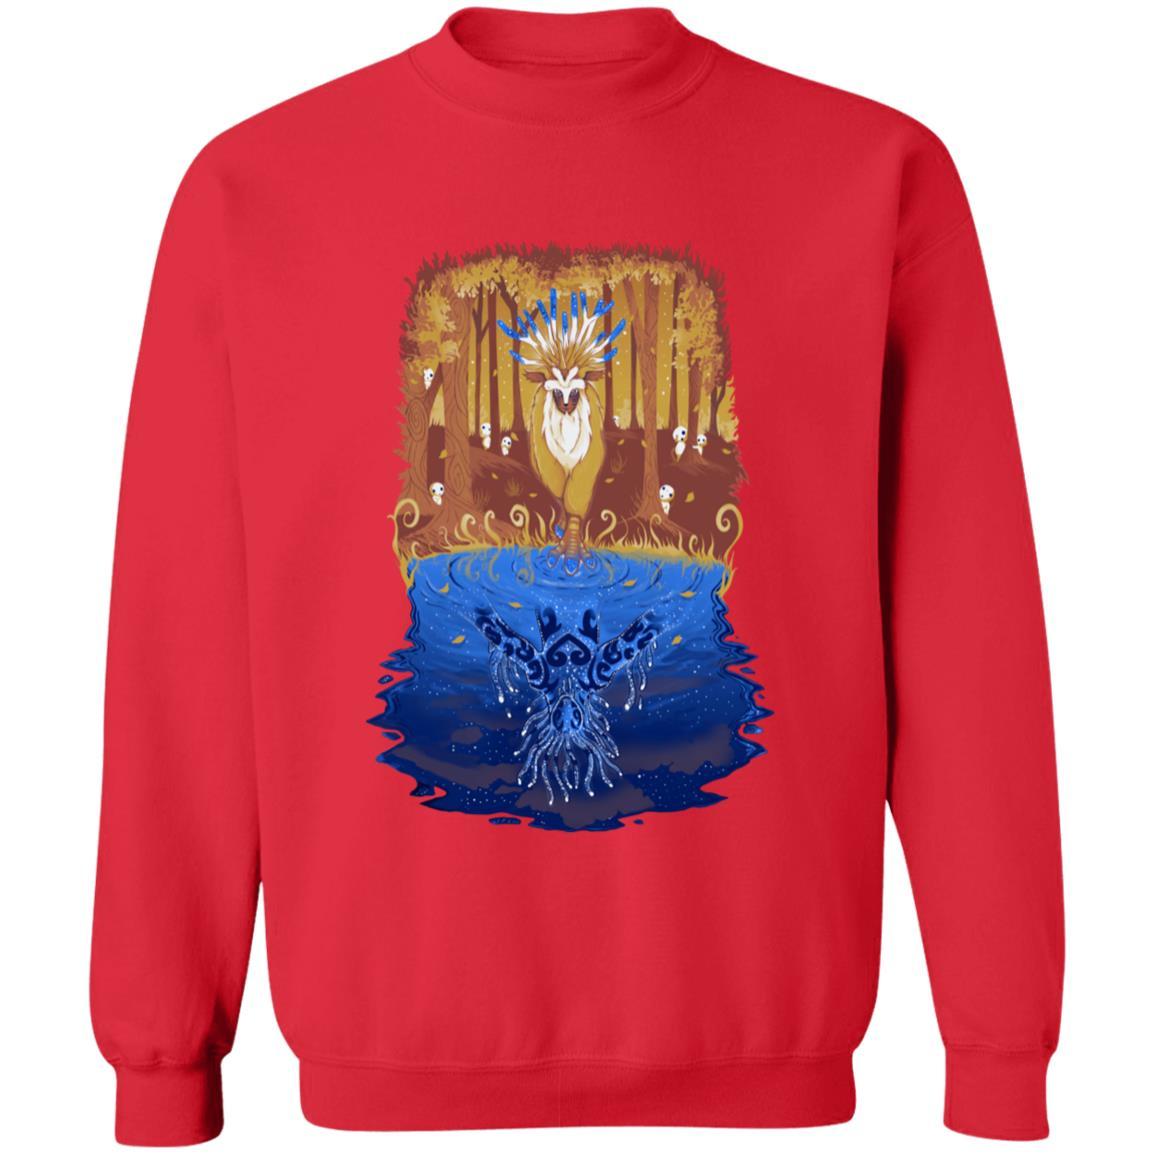 Princess Mononoke Shishigami Day and Night time Sweatshirt